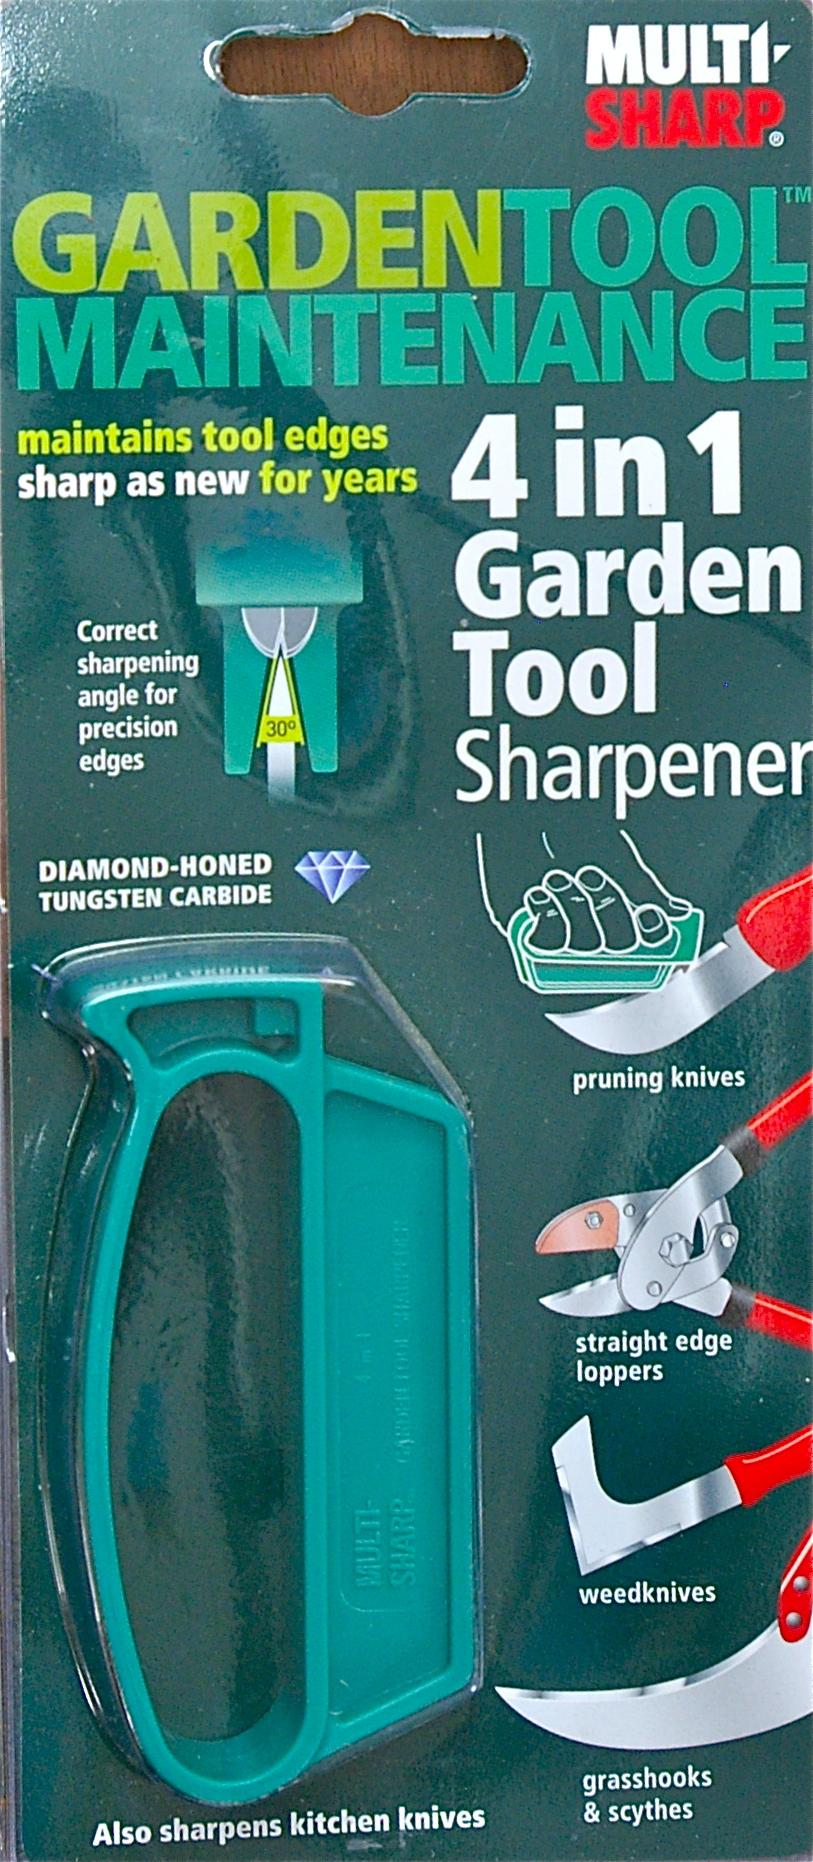 Multi Sharp 4 In 1 Garden Tool Sharpener Garden Shop Online